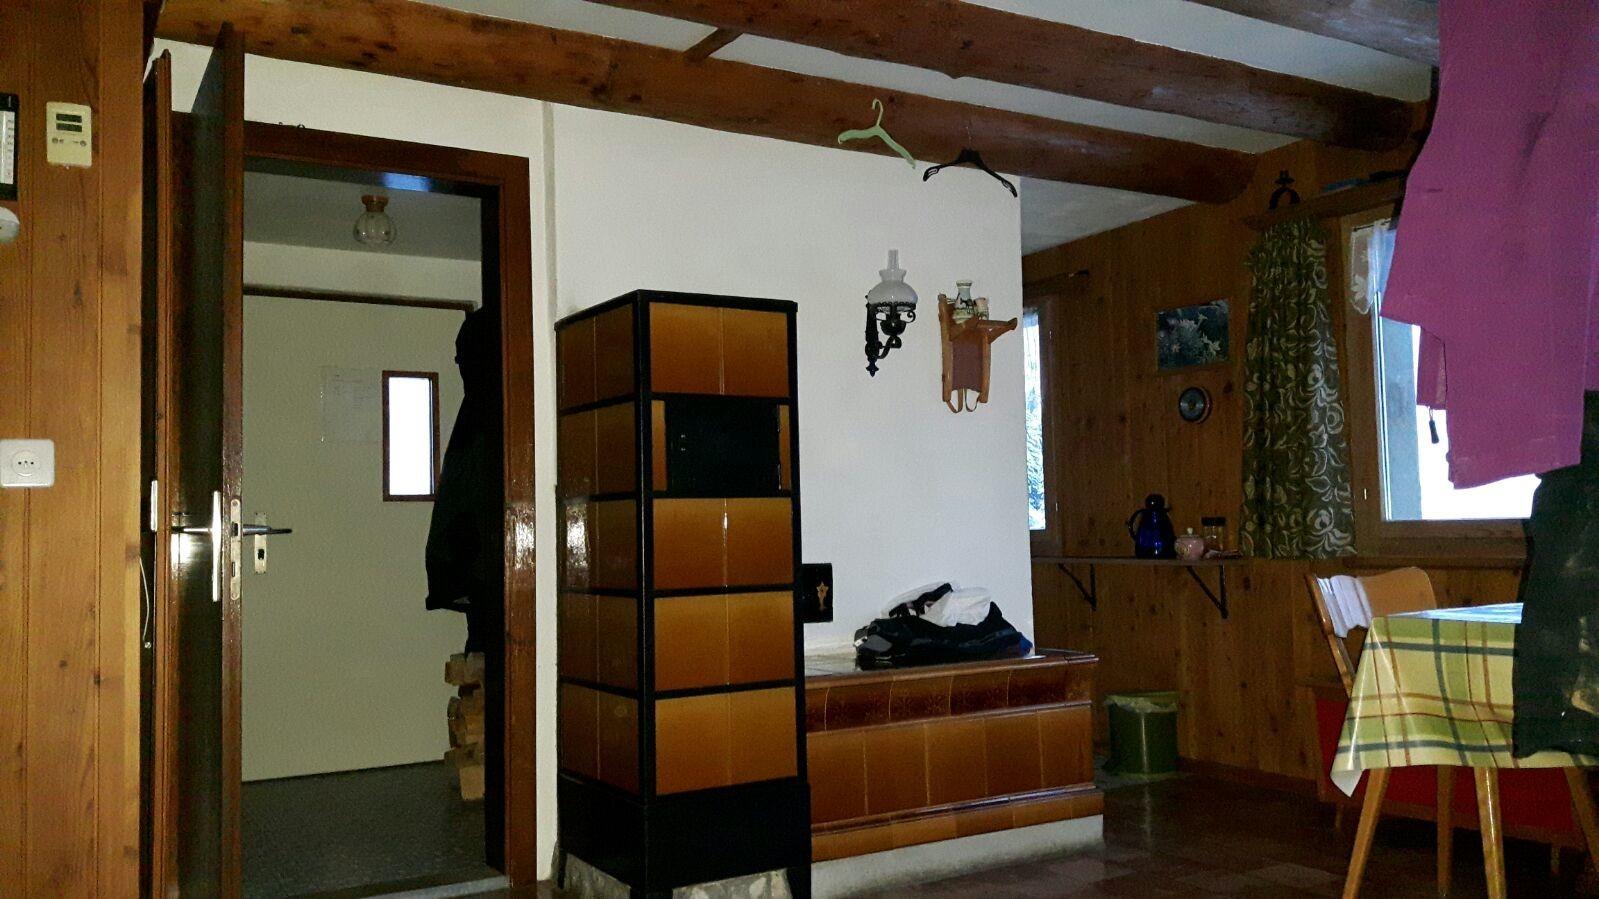 einrichtung rebberg buchholz silenen uri ruth und joe kempf holdener. Black Bedroom Furniture Sets. Home Design Ideas